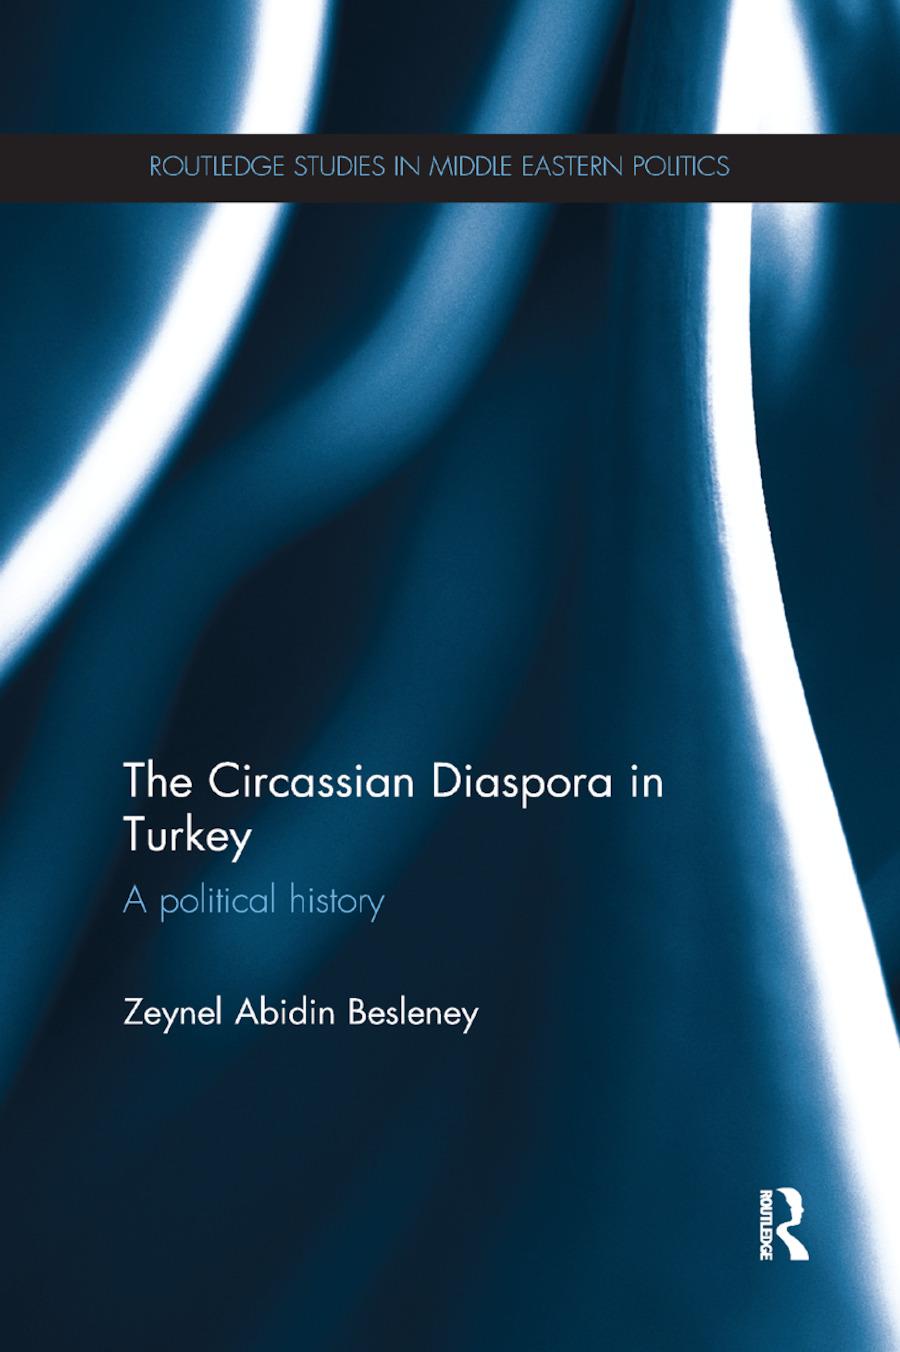 The Circassian Diaspora in Turkey: A Political History book cover